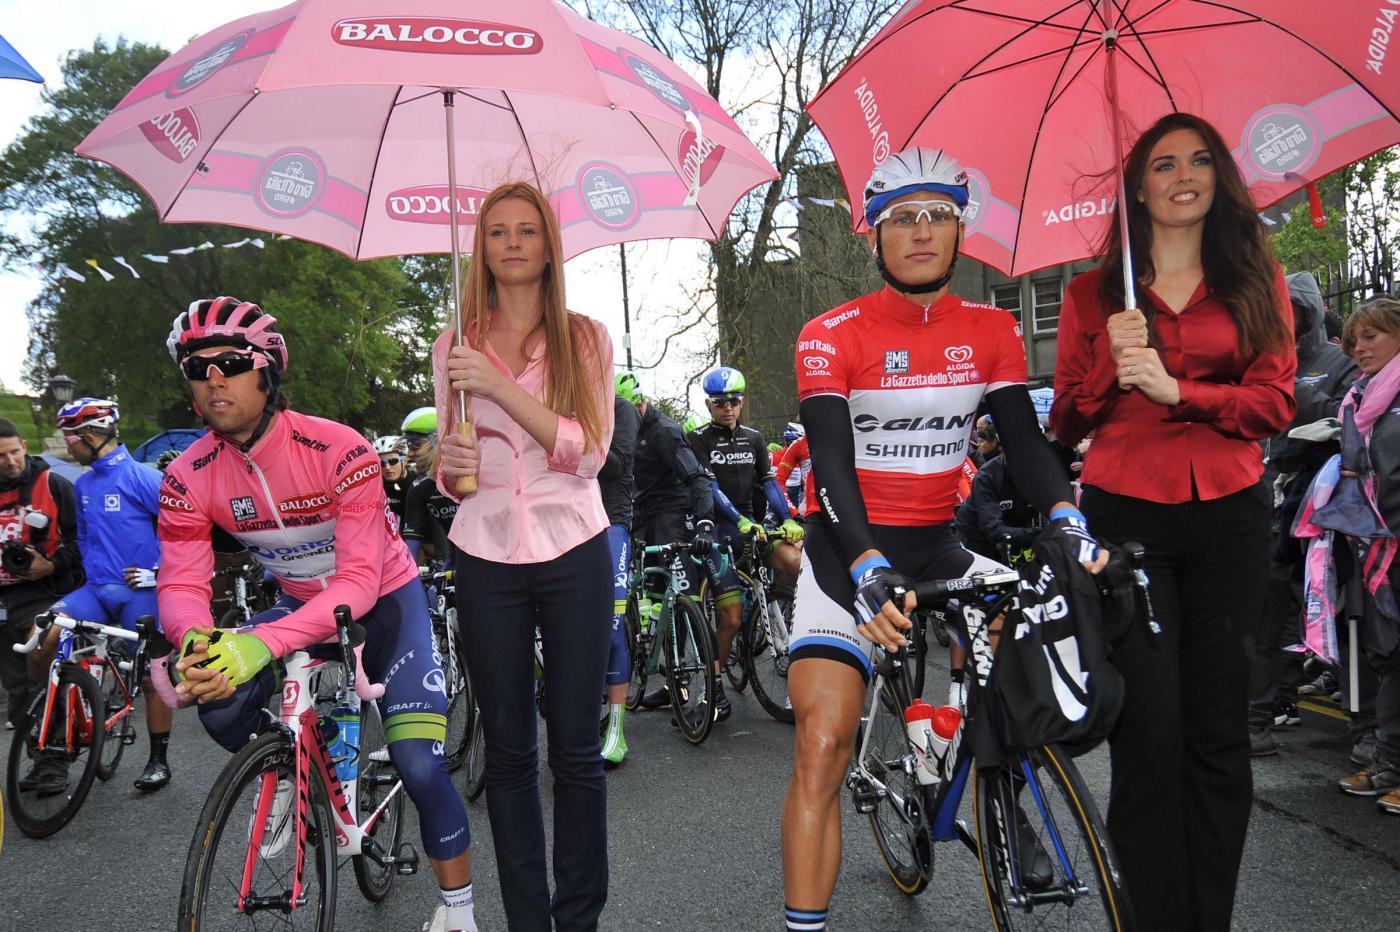 Giro 2014 terza tappa